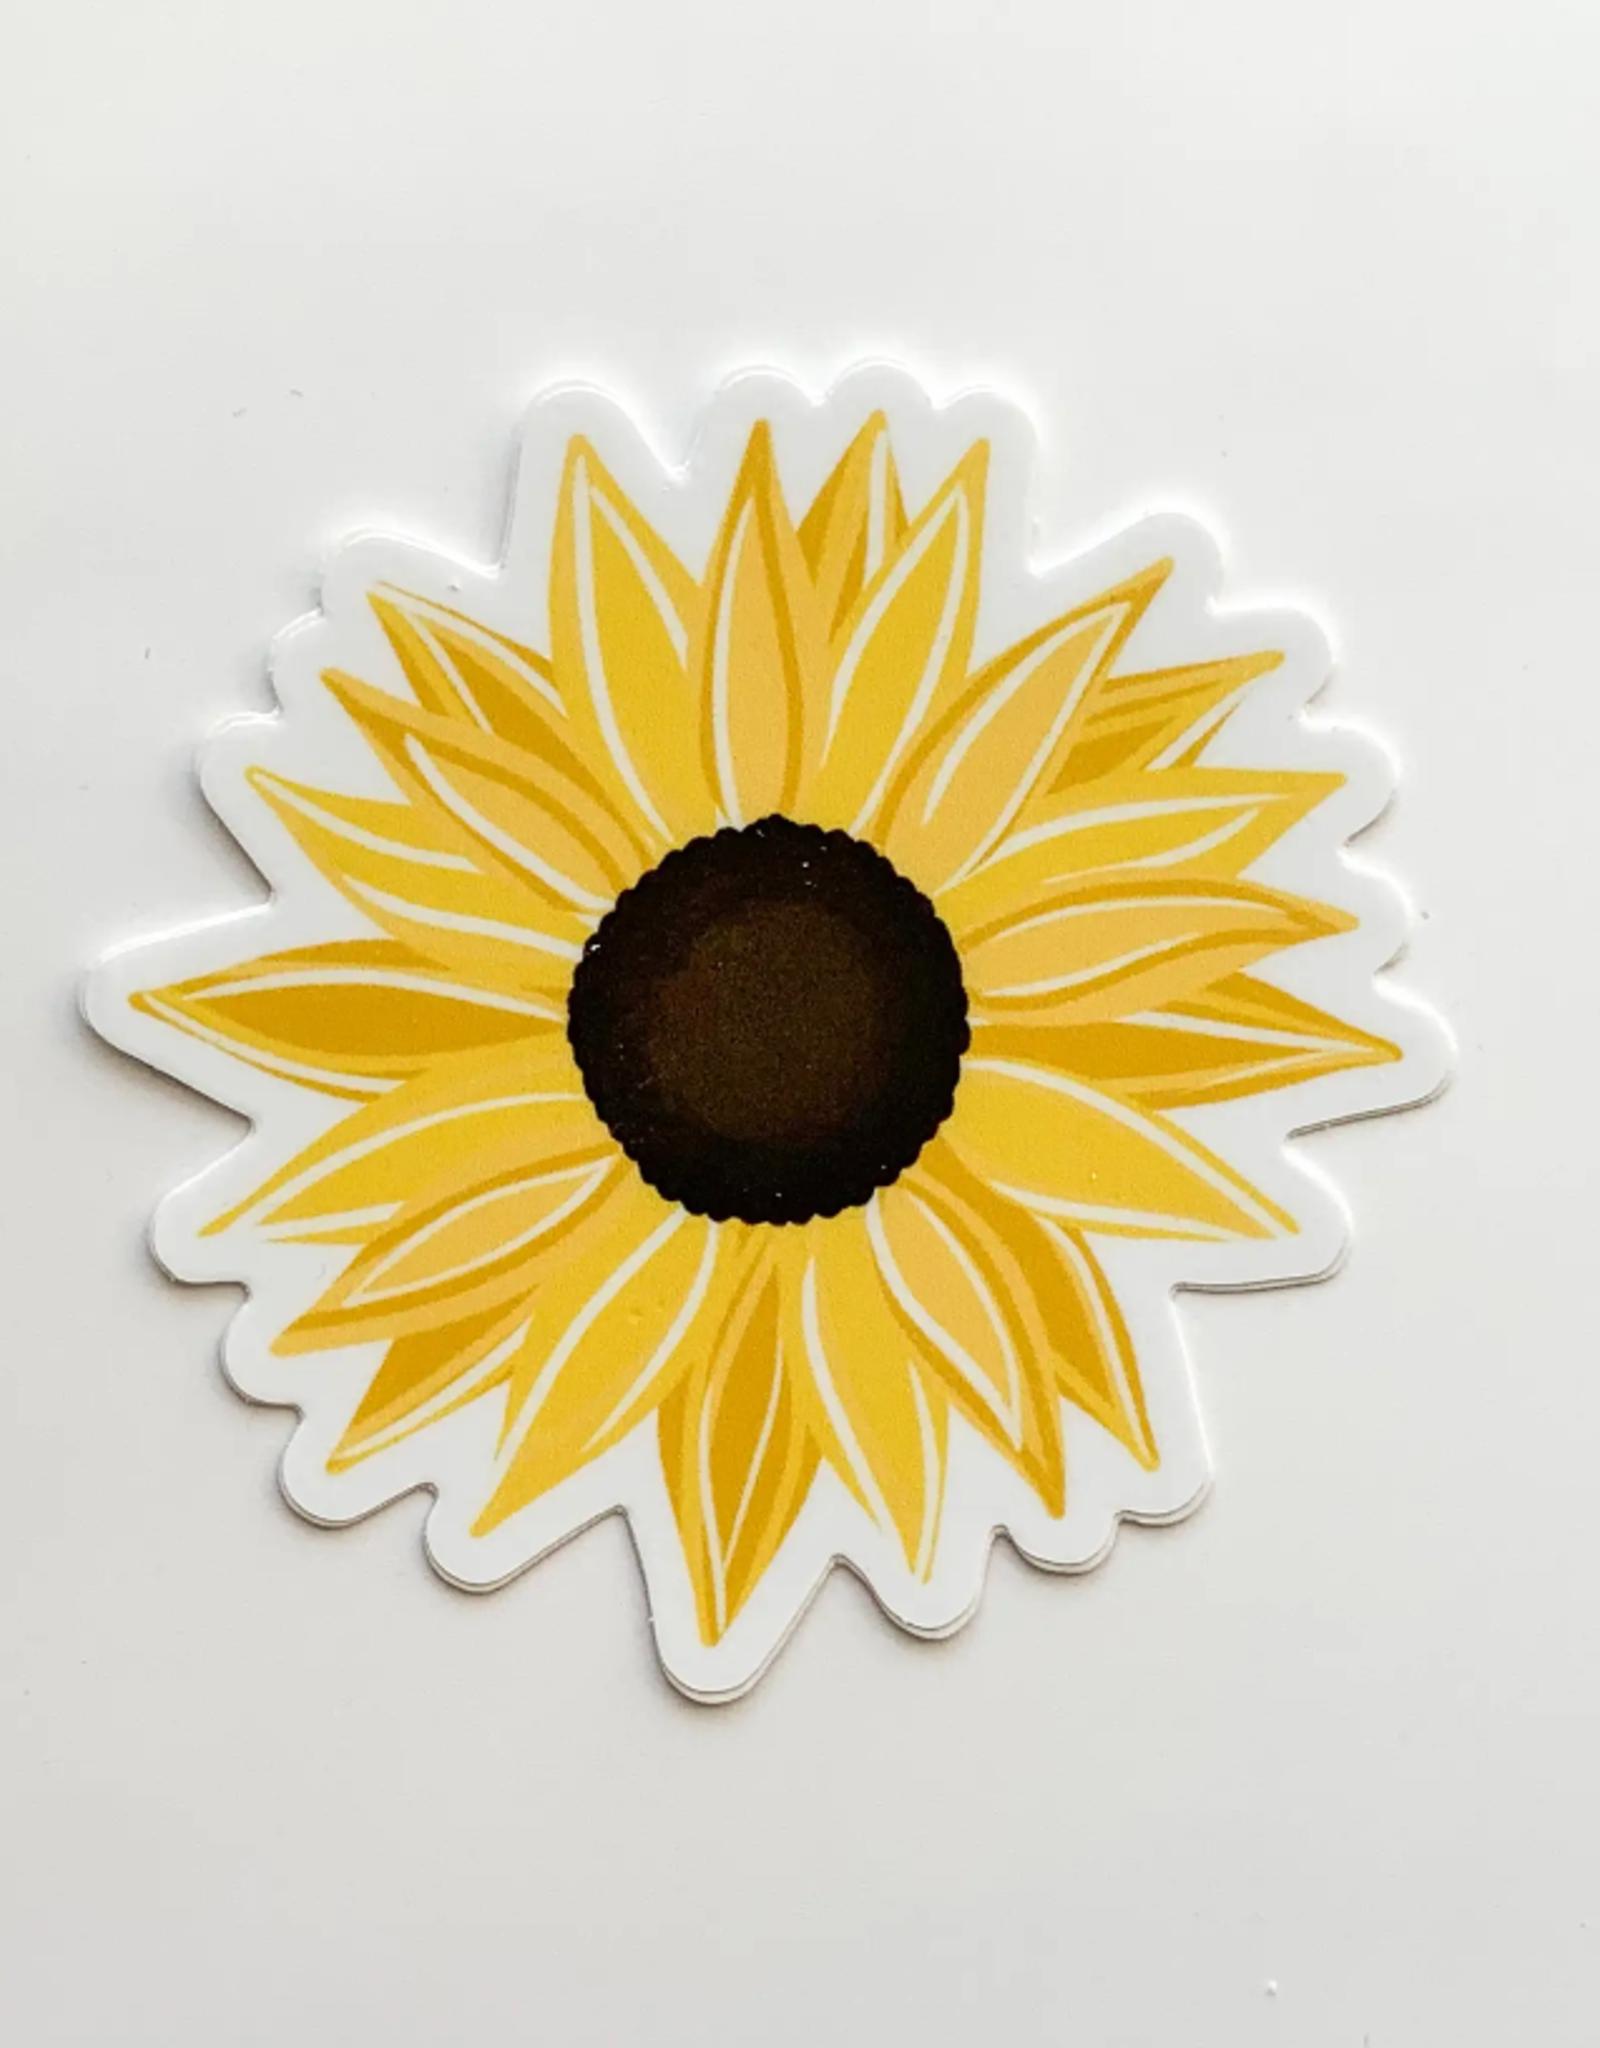 Sunflower waterproof sticker